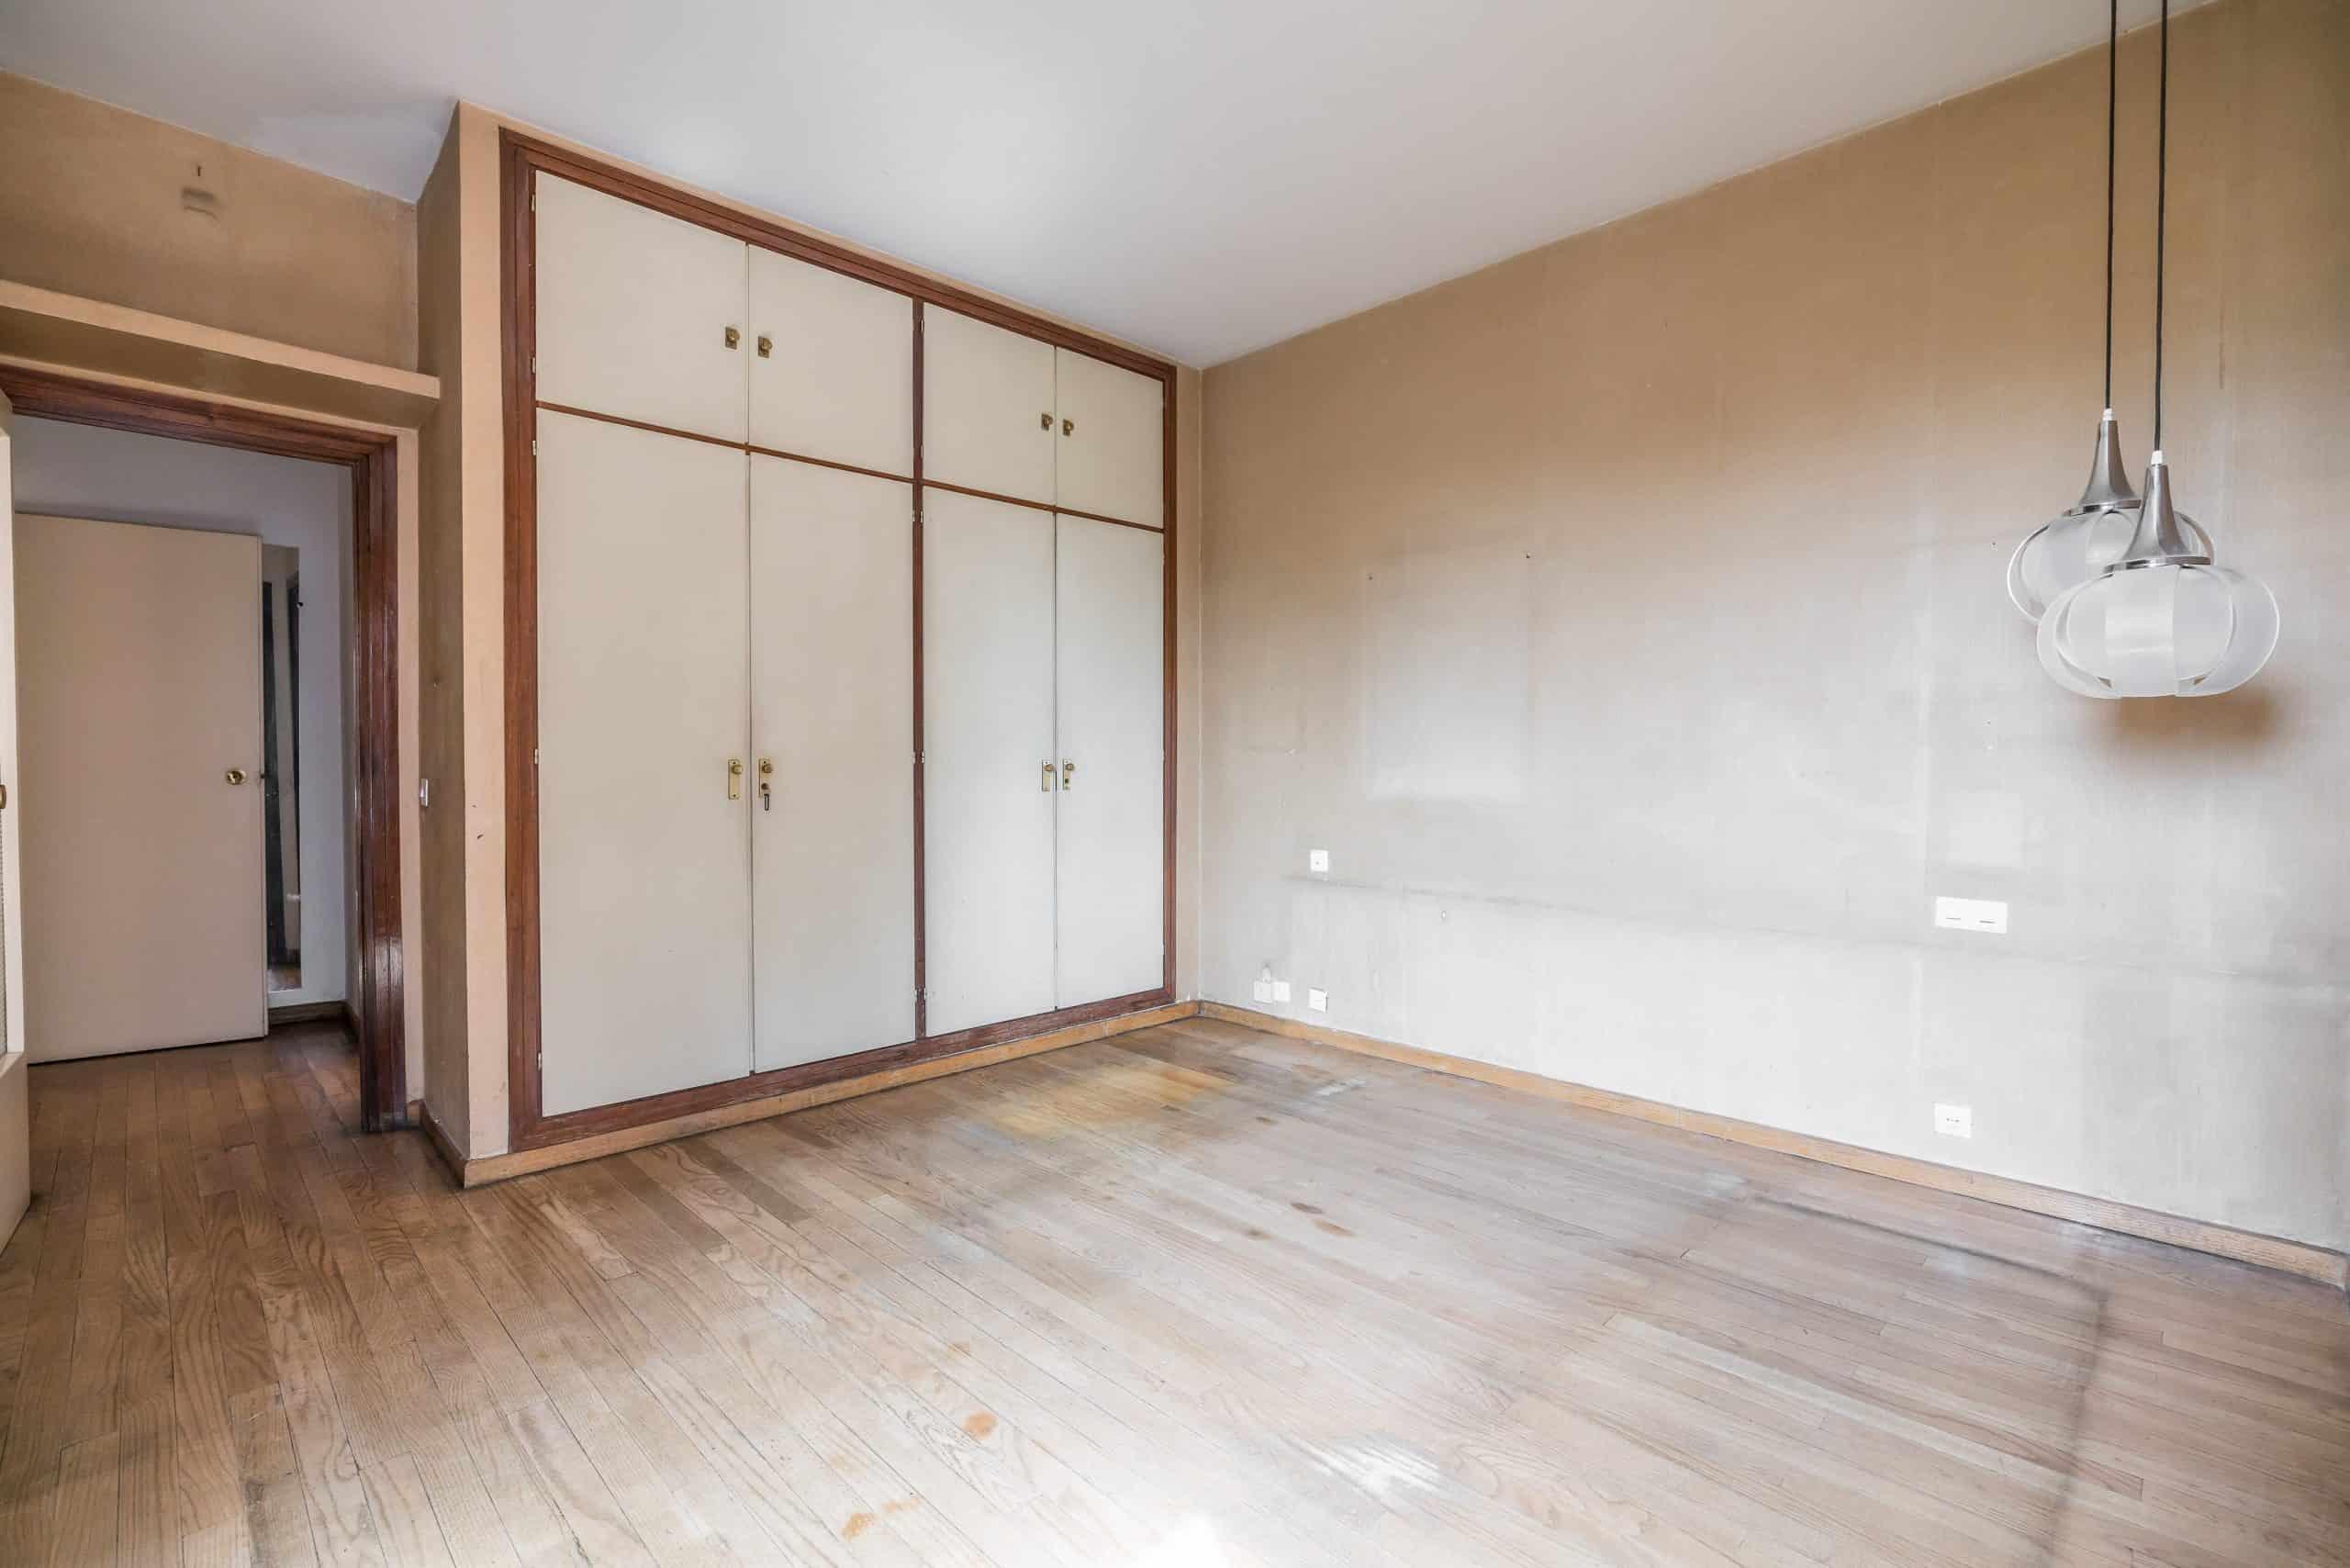 Agencia Inmobiliaria de Madrid-FUTUROCASA-Zona ARGANZUELA-EMBAJADORES-LEGAZPI -calle Embajadores- baño 18